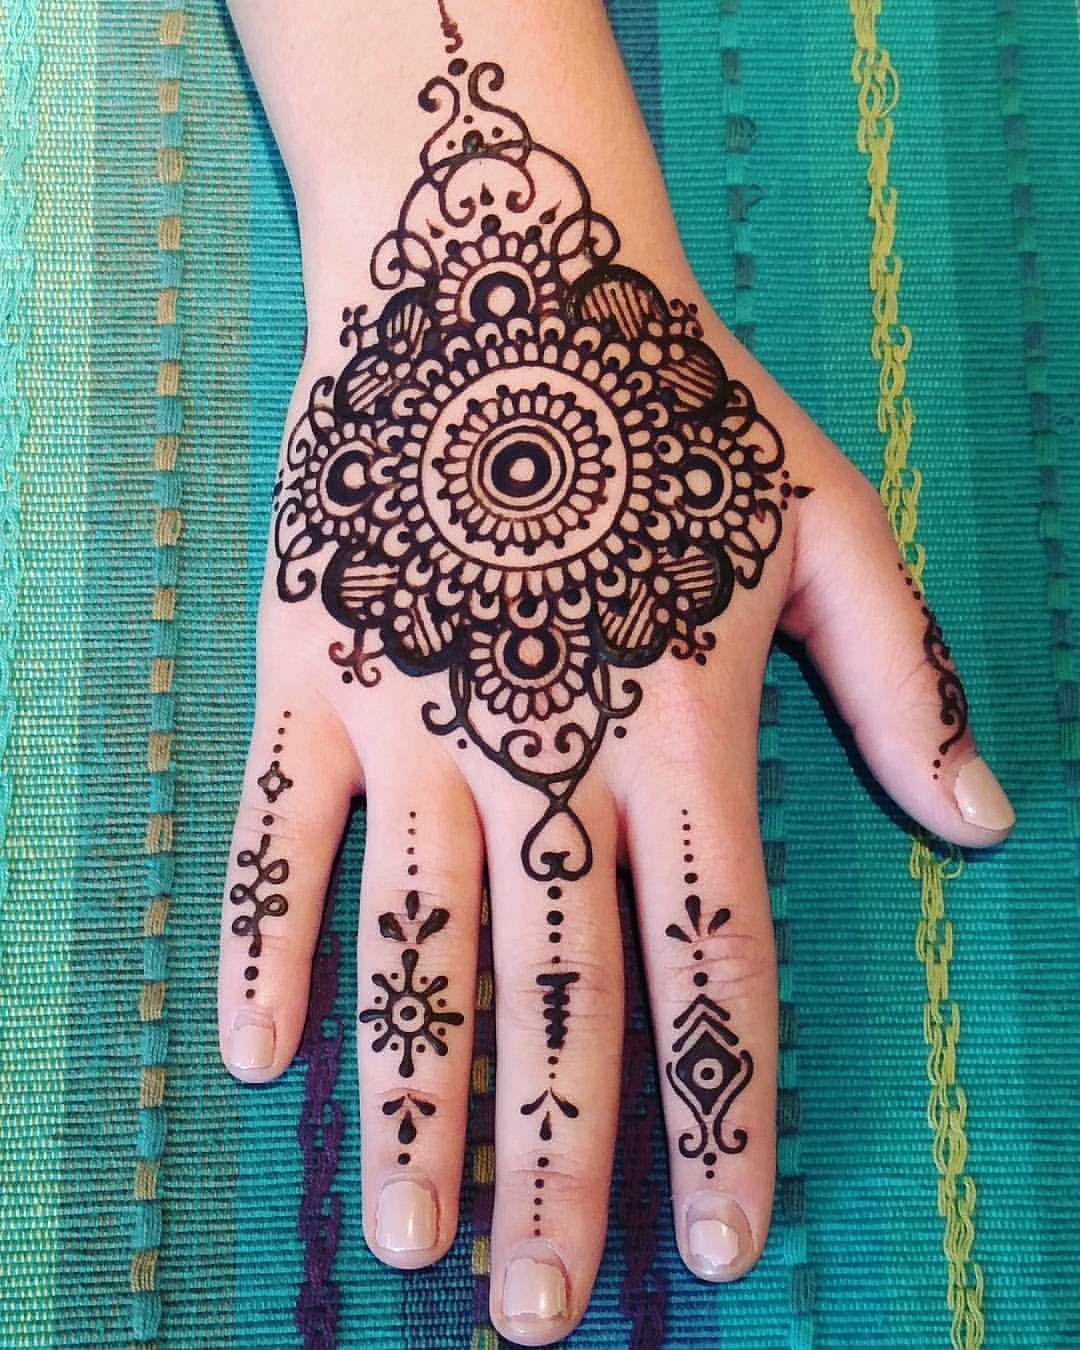 Engineering graduate breaks stereotypes with her henna art